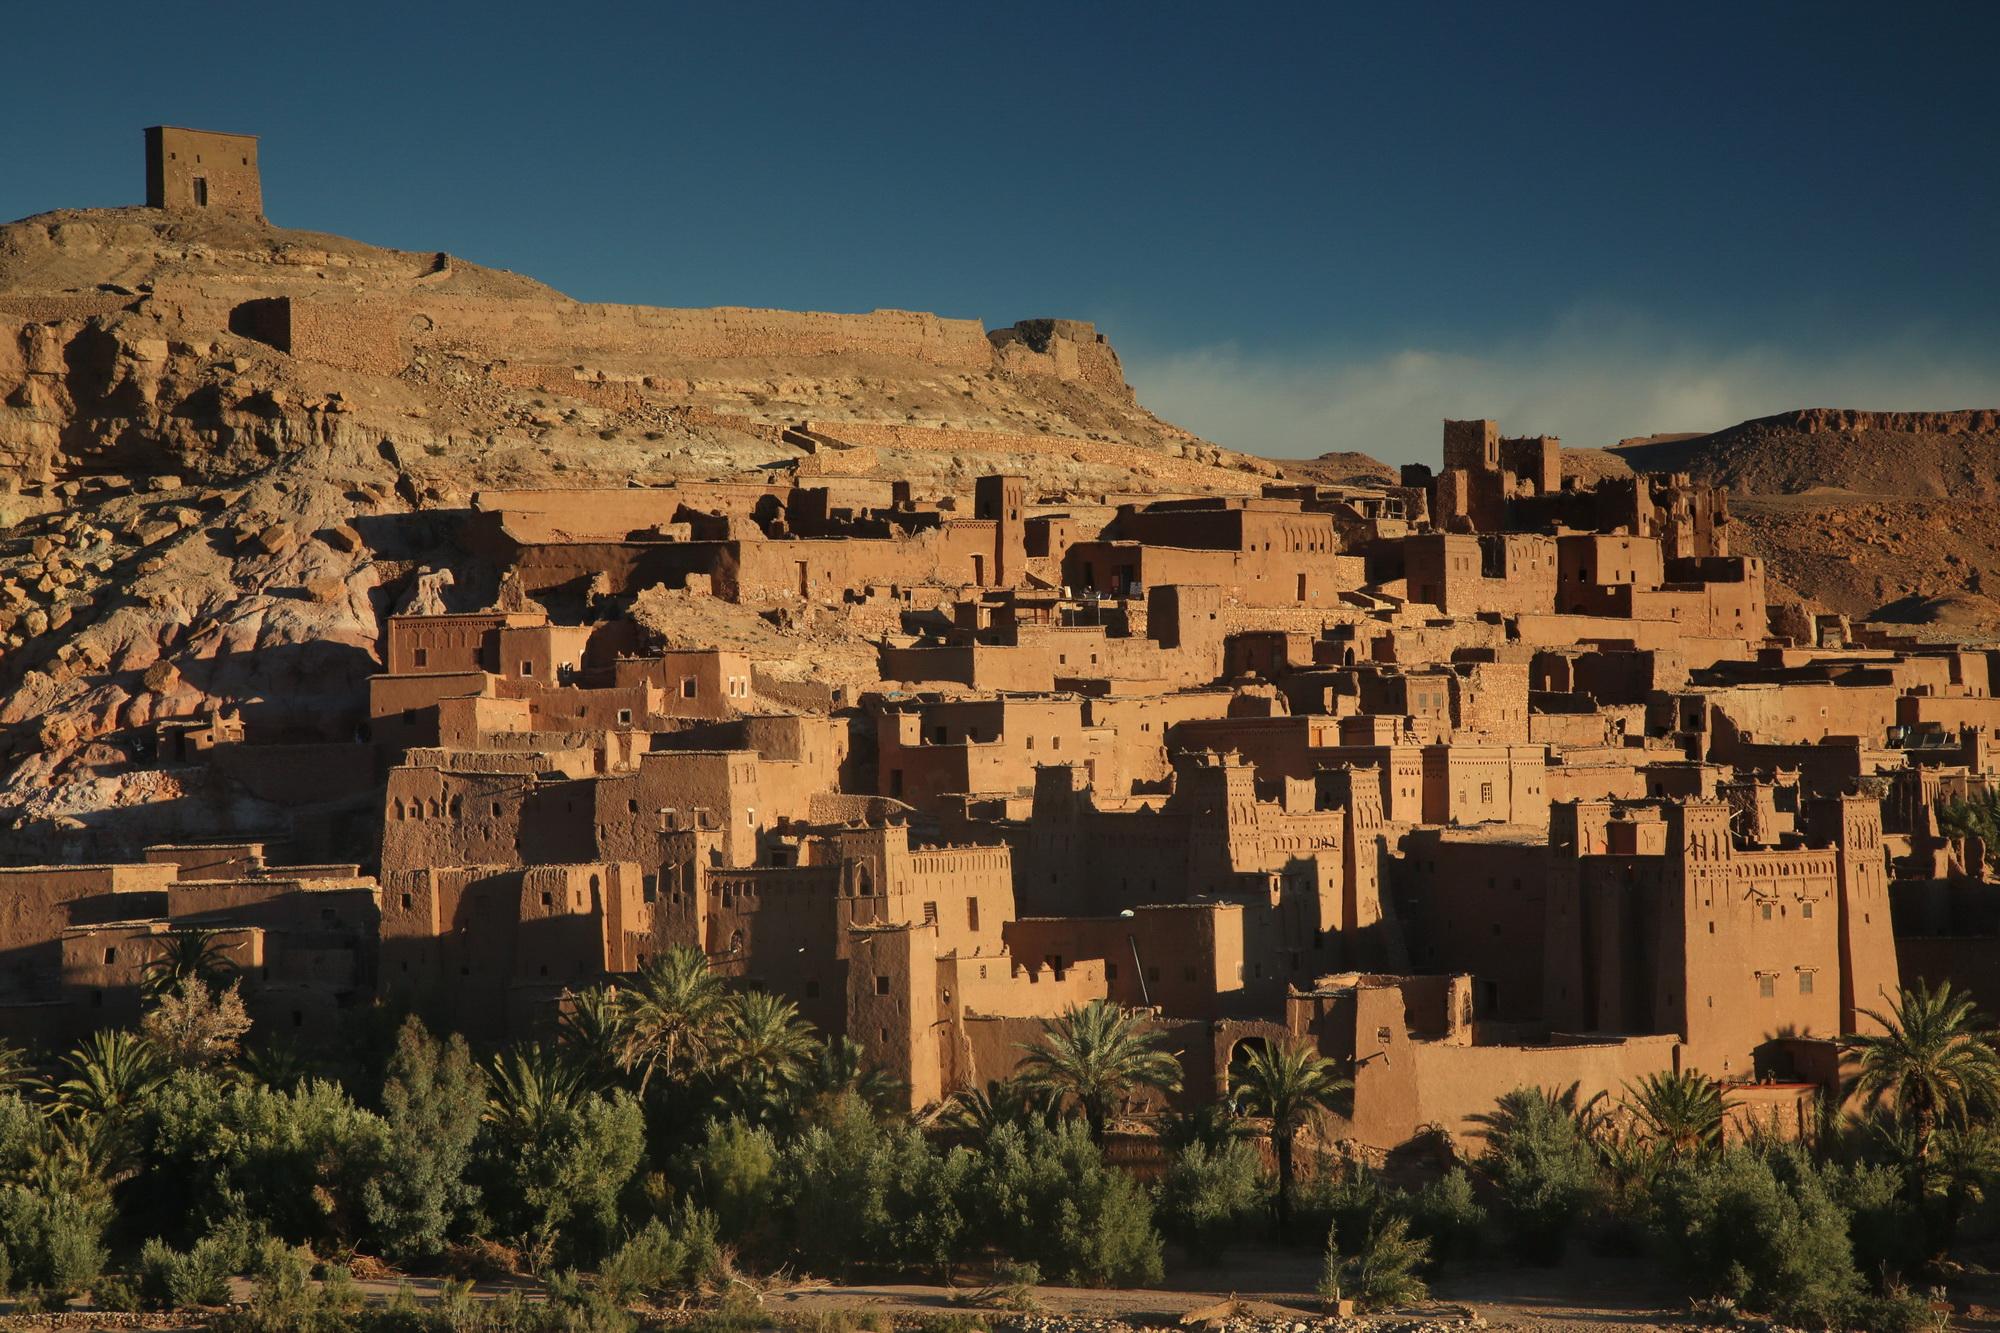 Marocco_IQ2A2979_∏ Luca Bracali